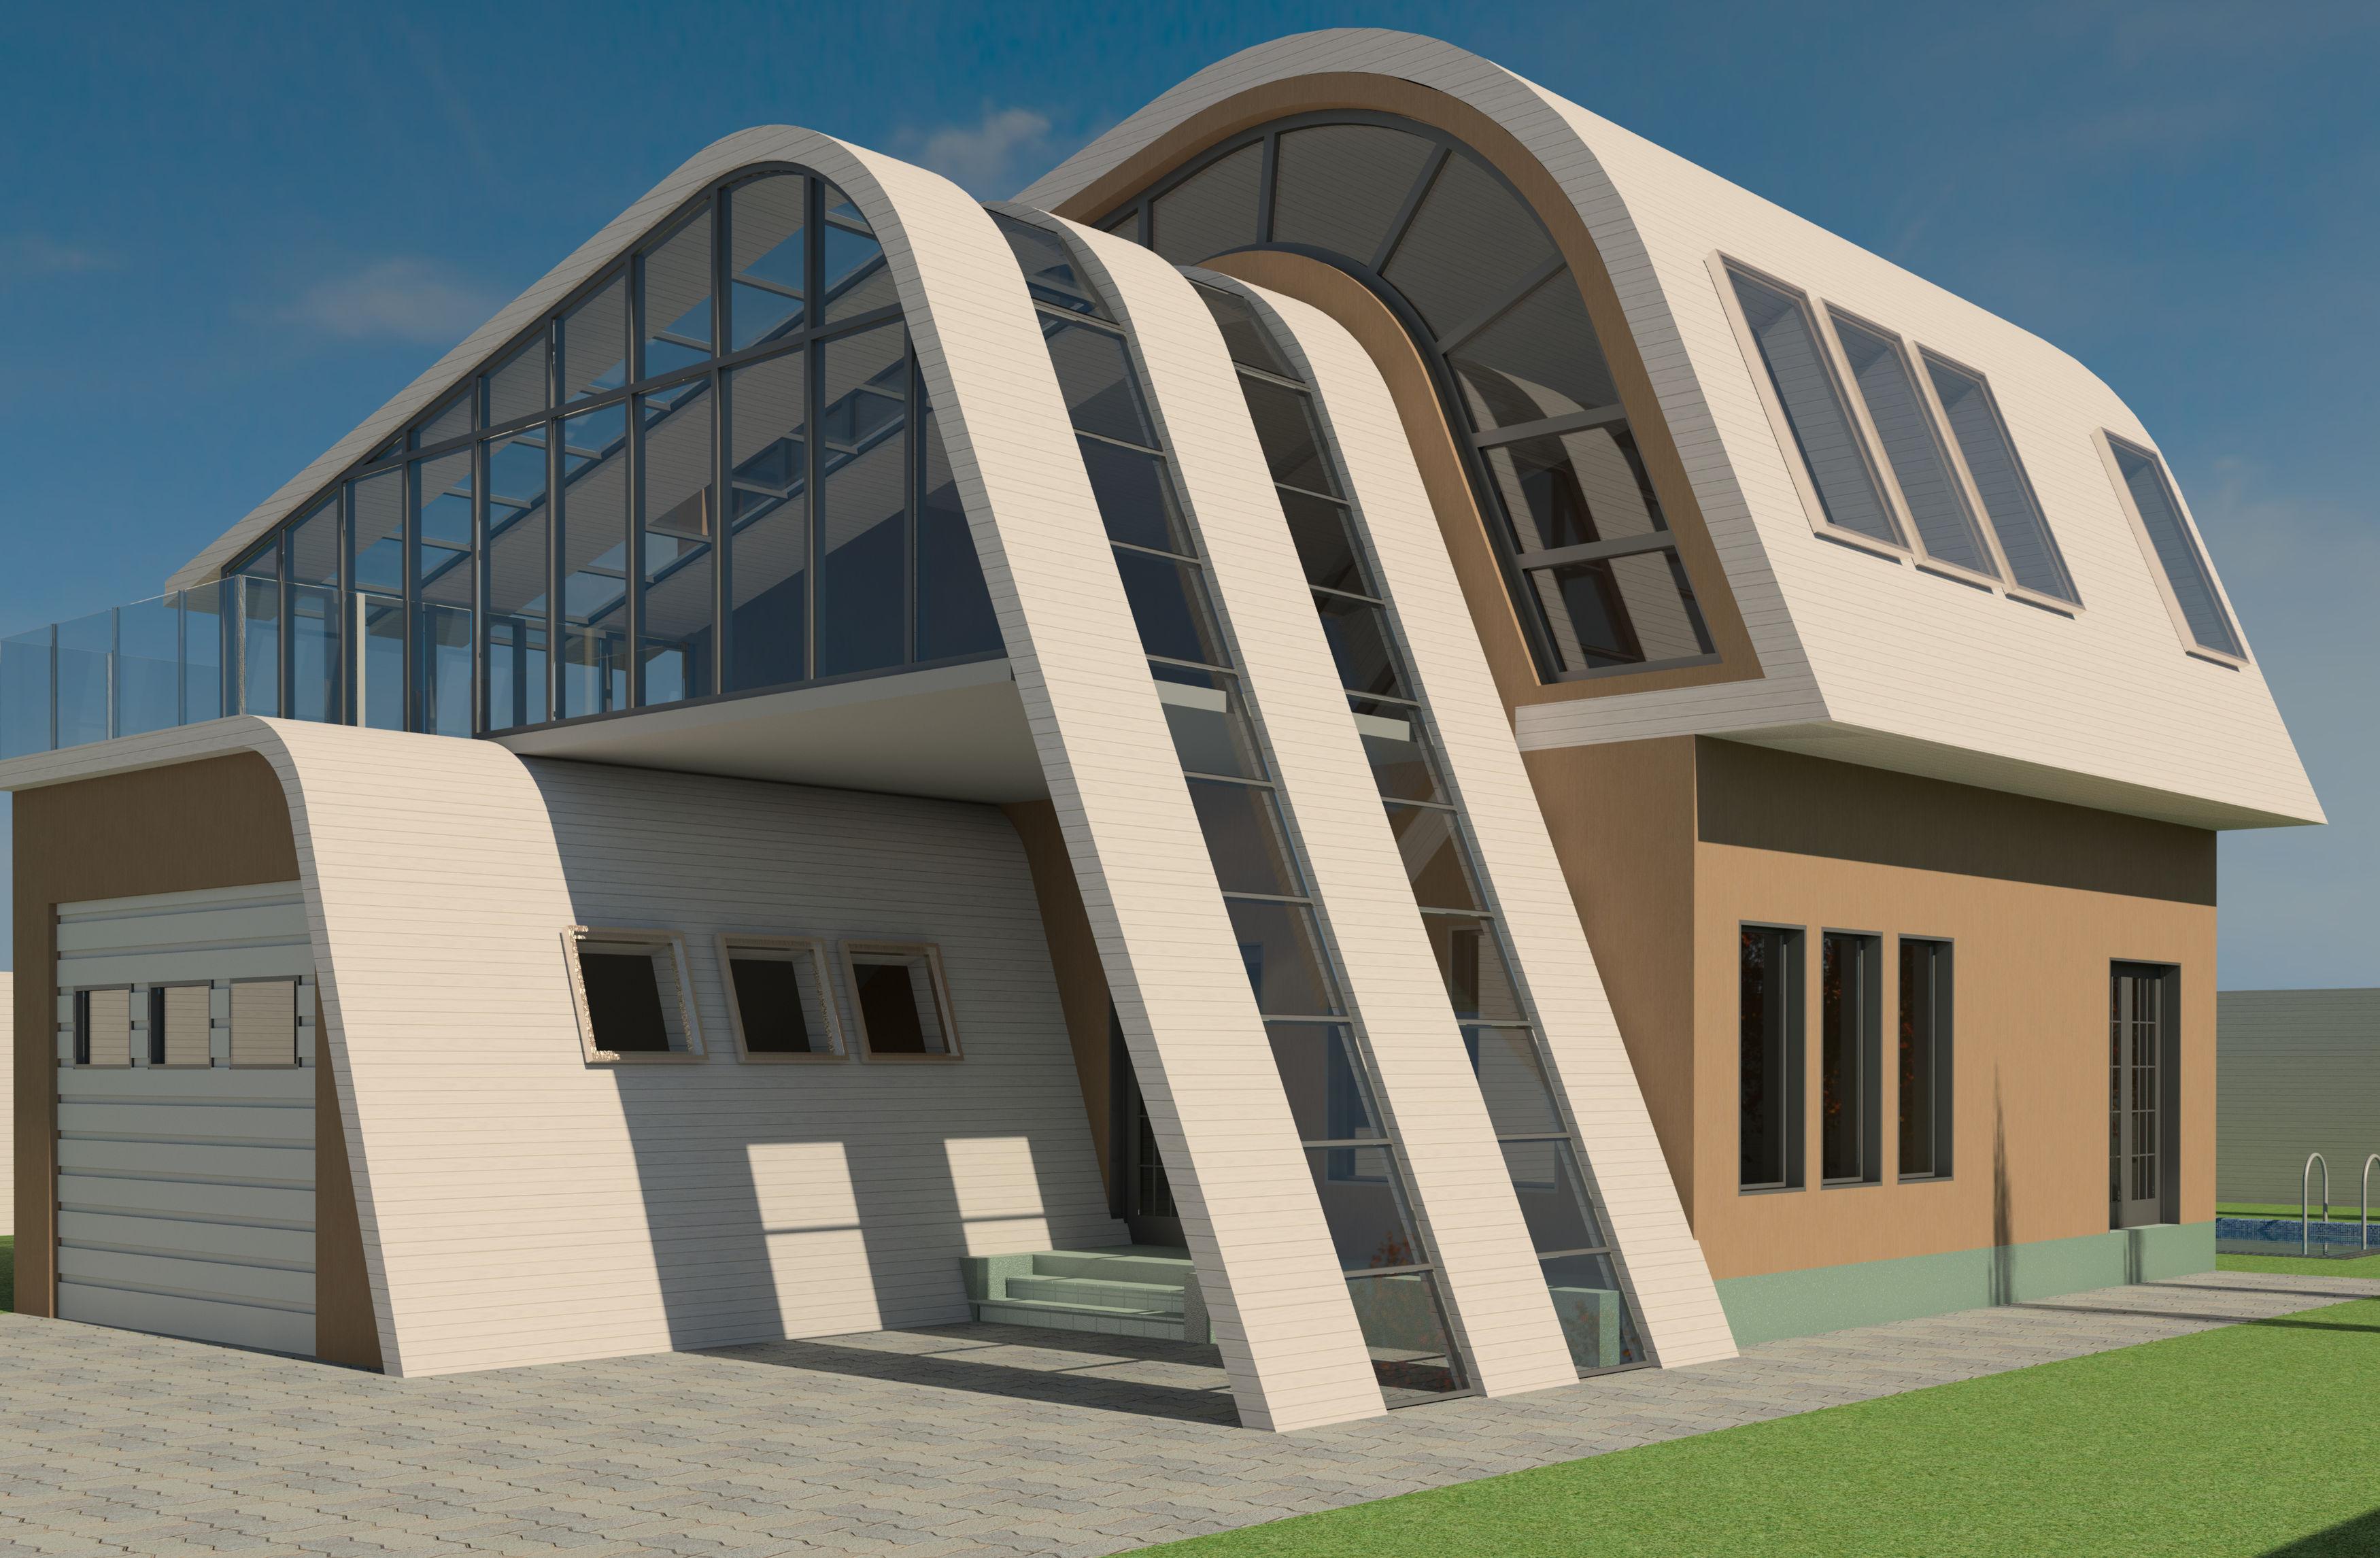 Modern House TutorialAutodesk Online Gallery